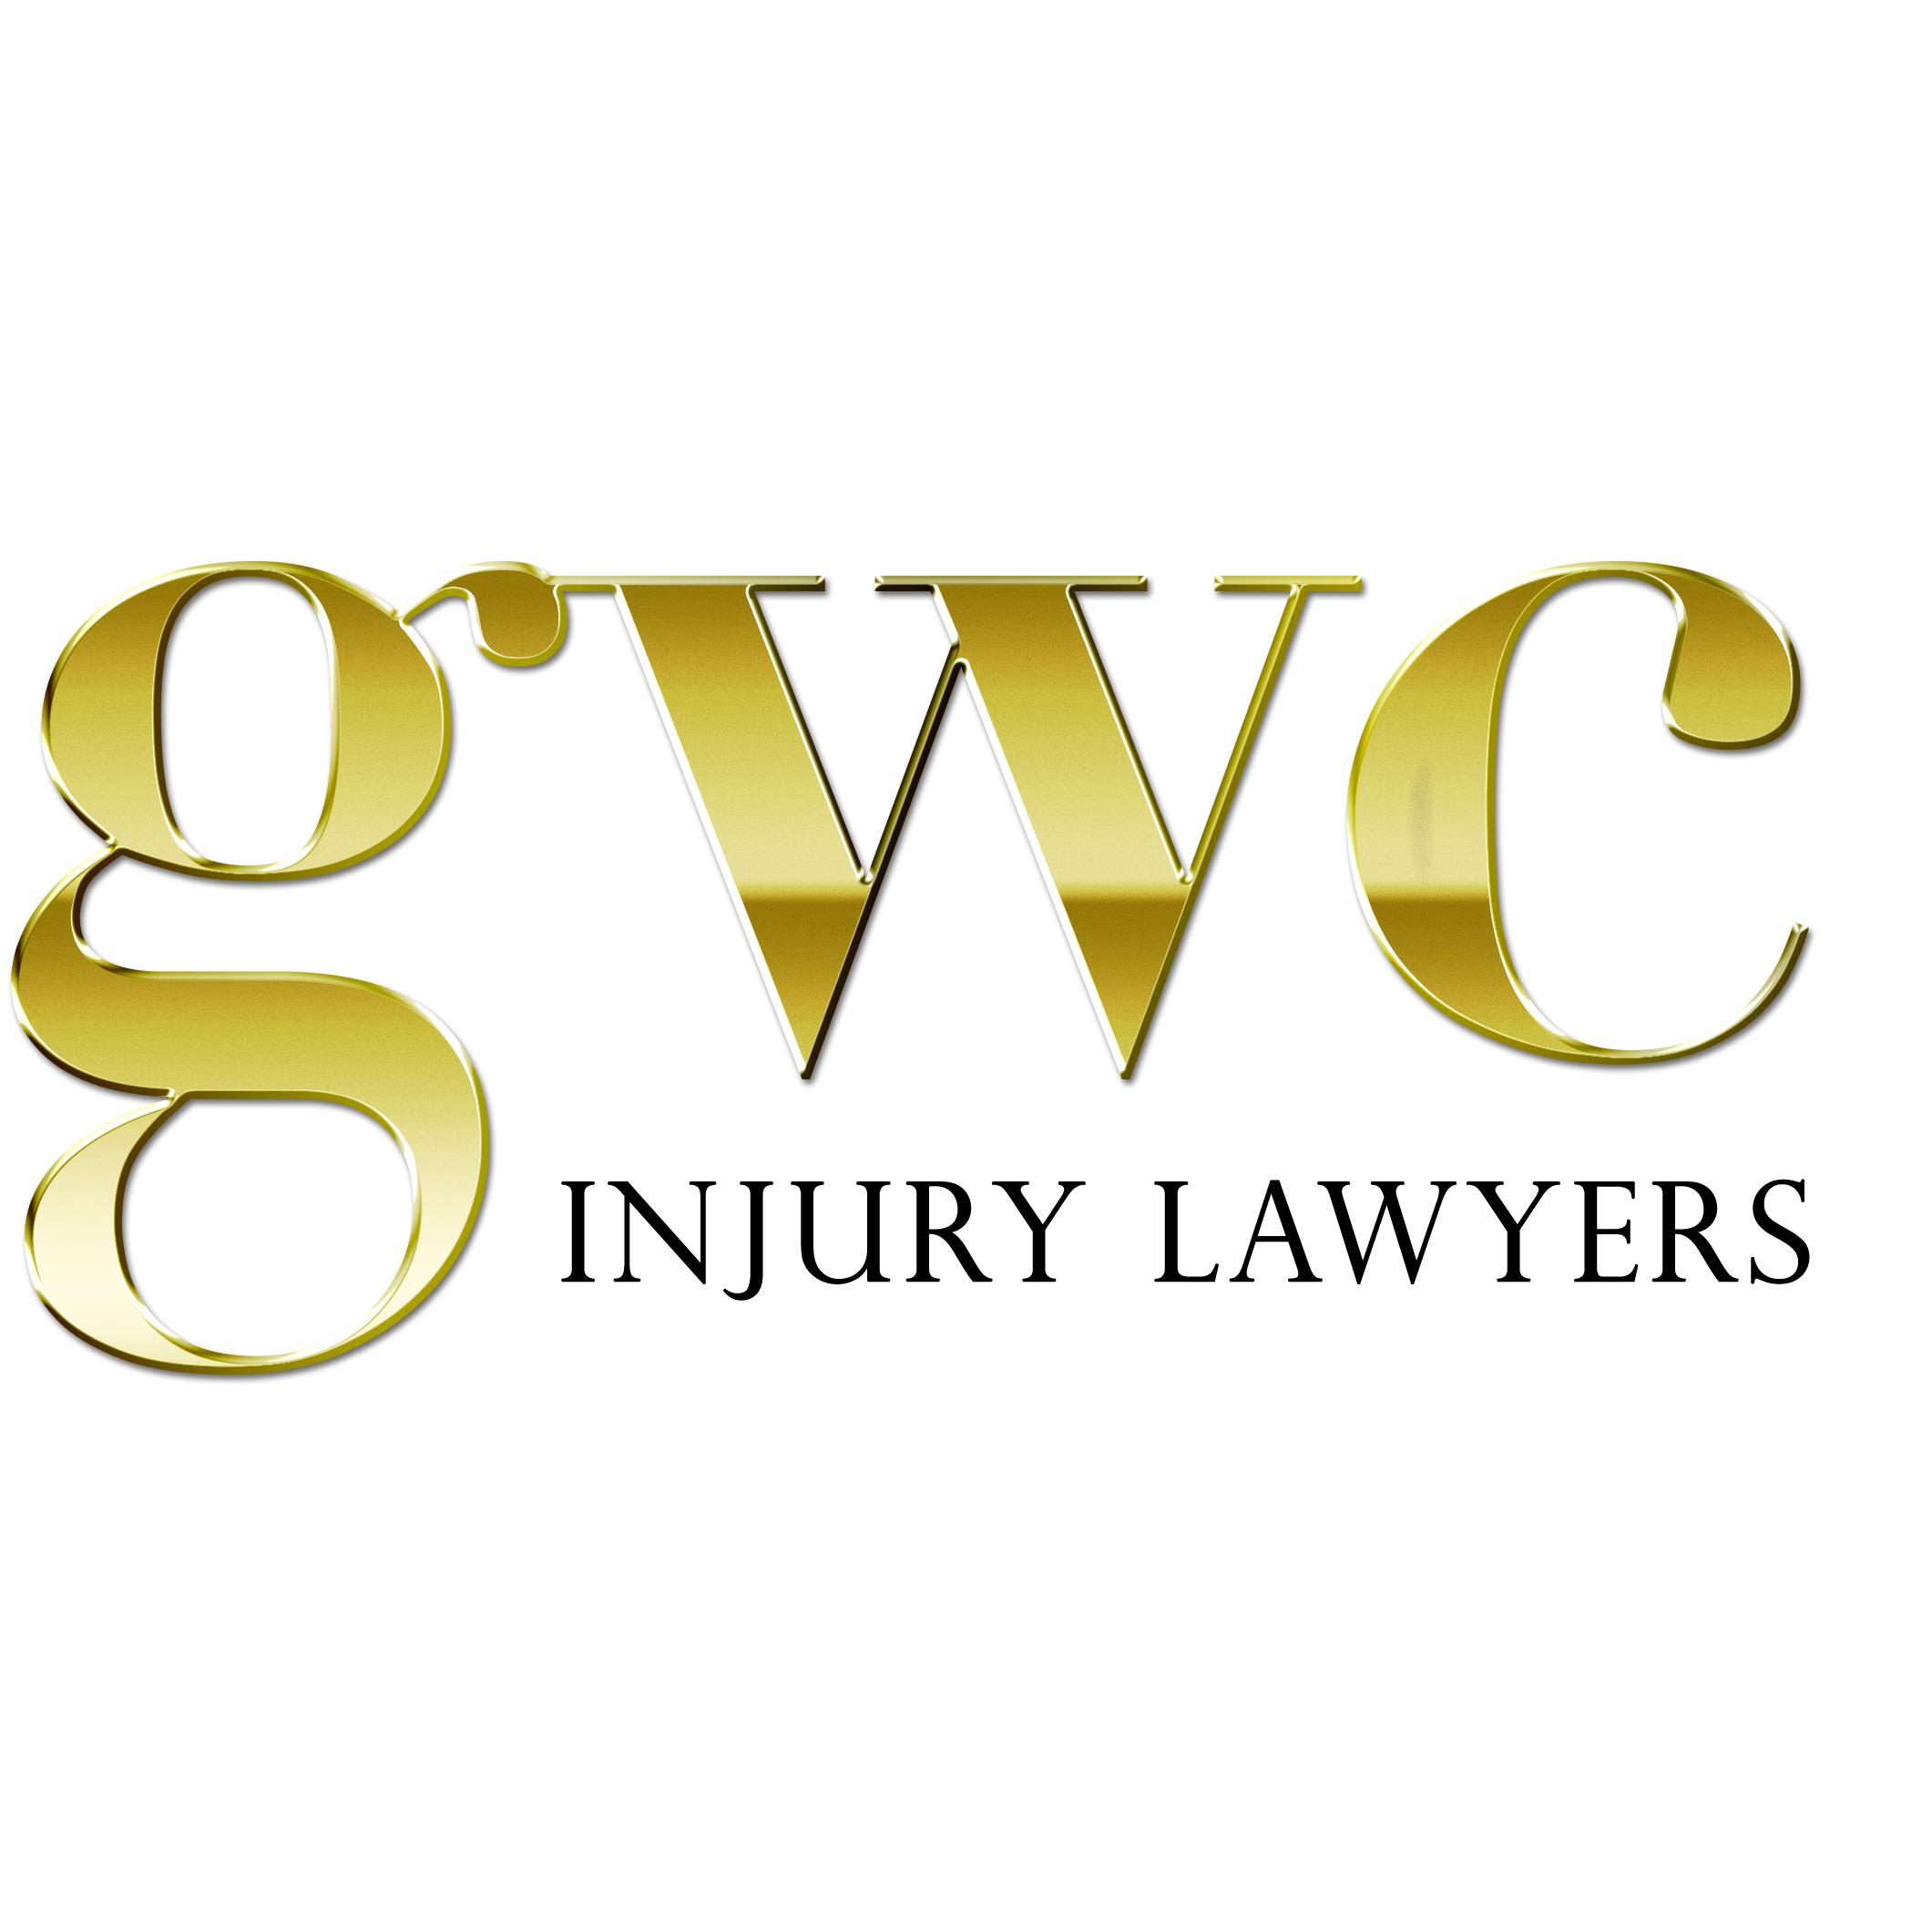 GWC Injury Lawyers LLC image 2